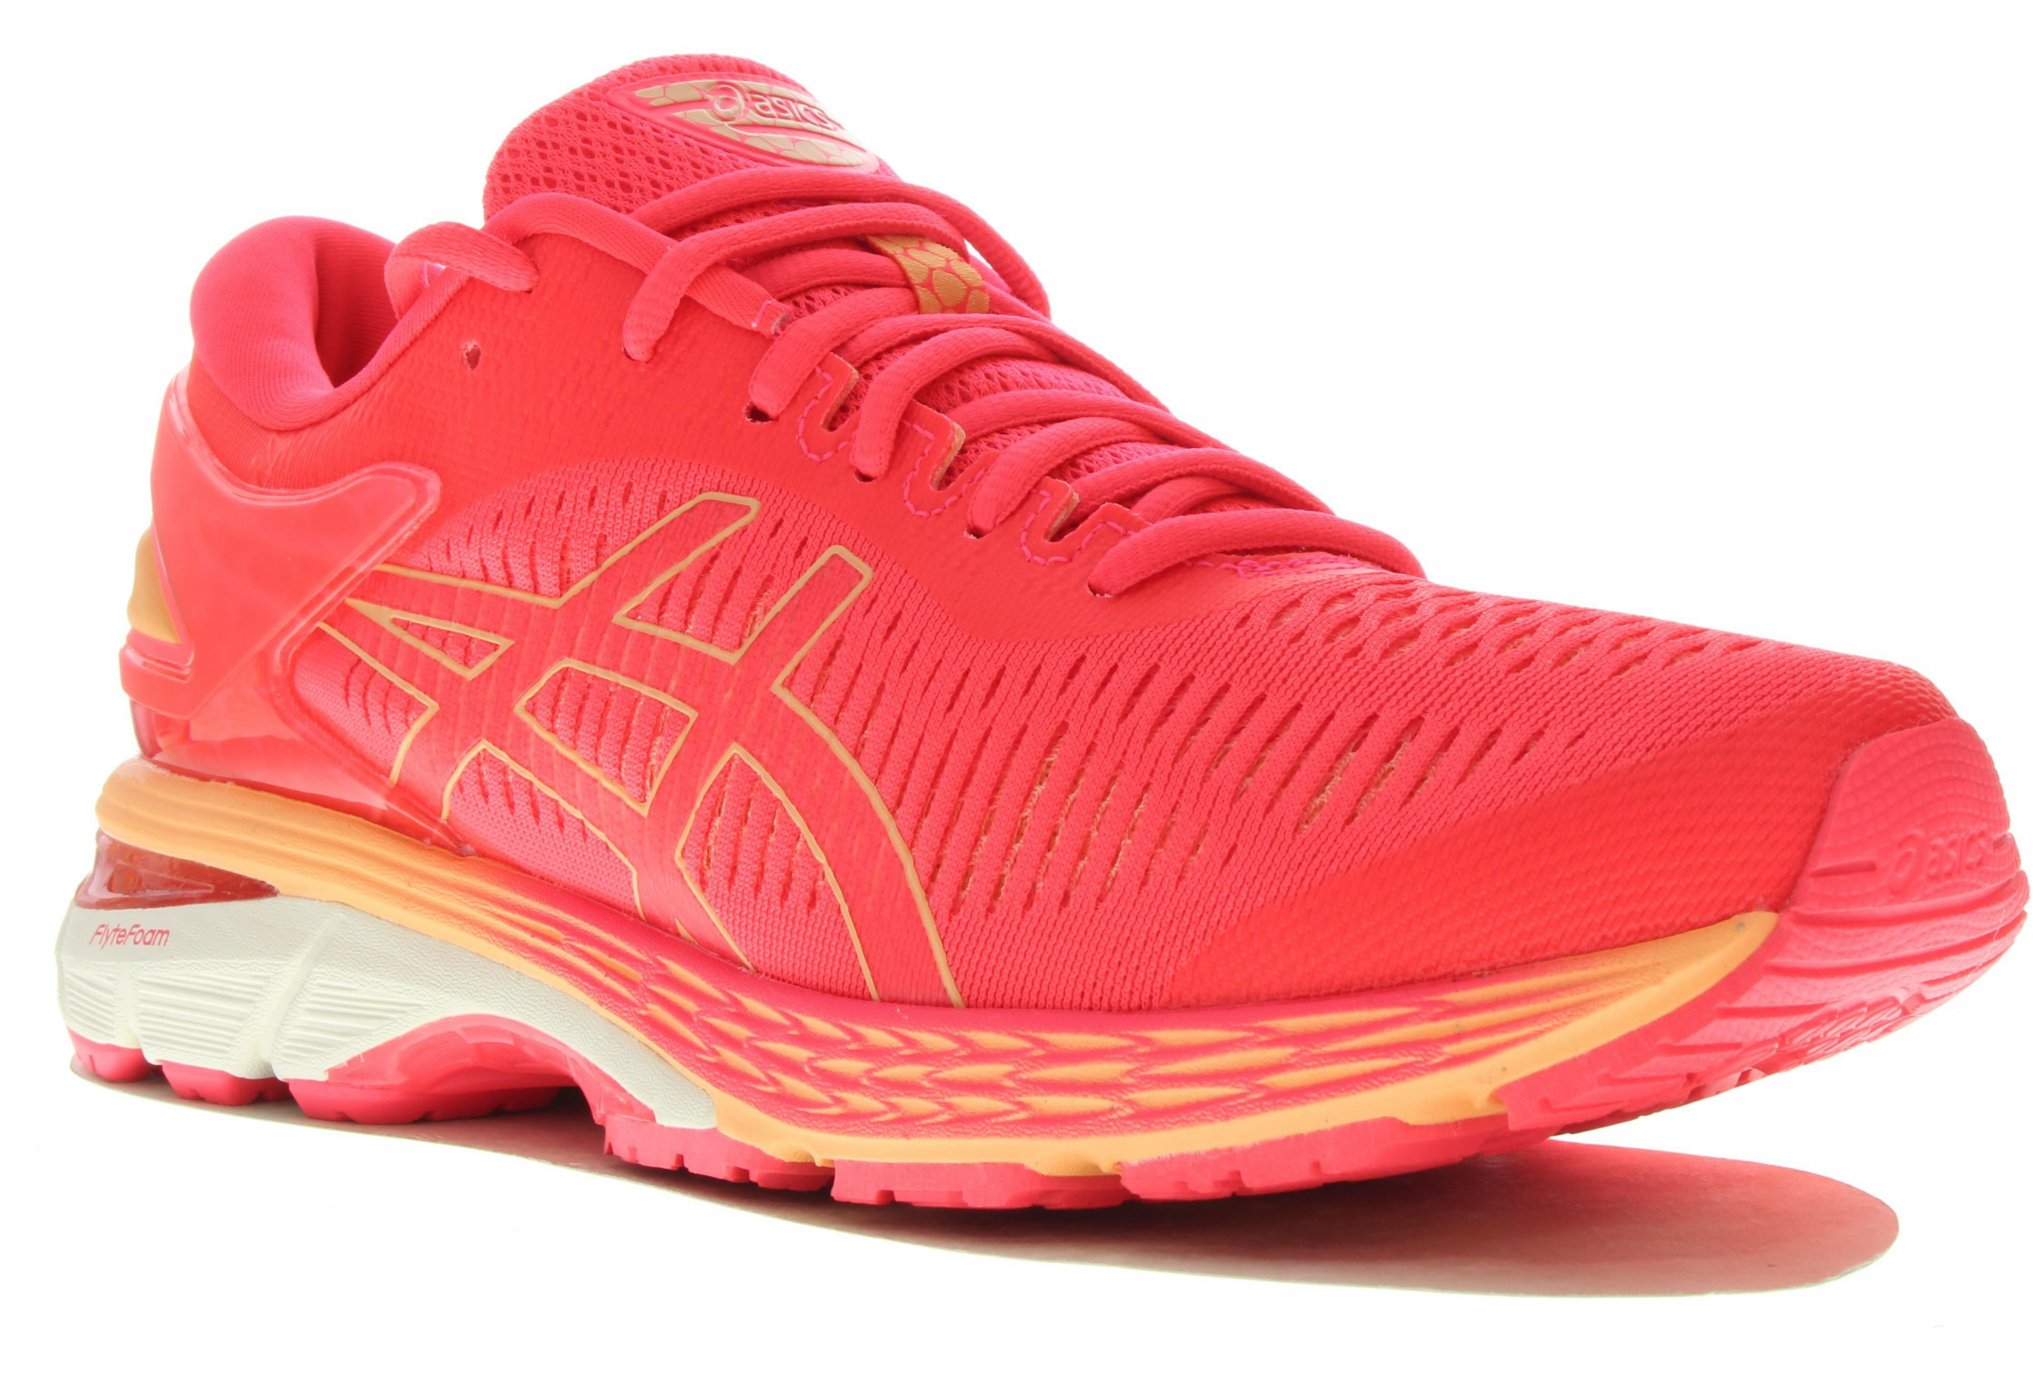 La Fortifiée Asics Gel Kayano 25 W Chaussures running femme